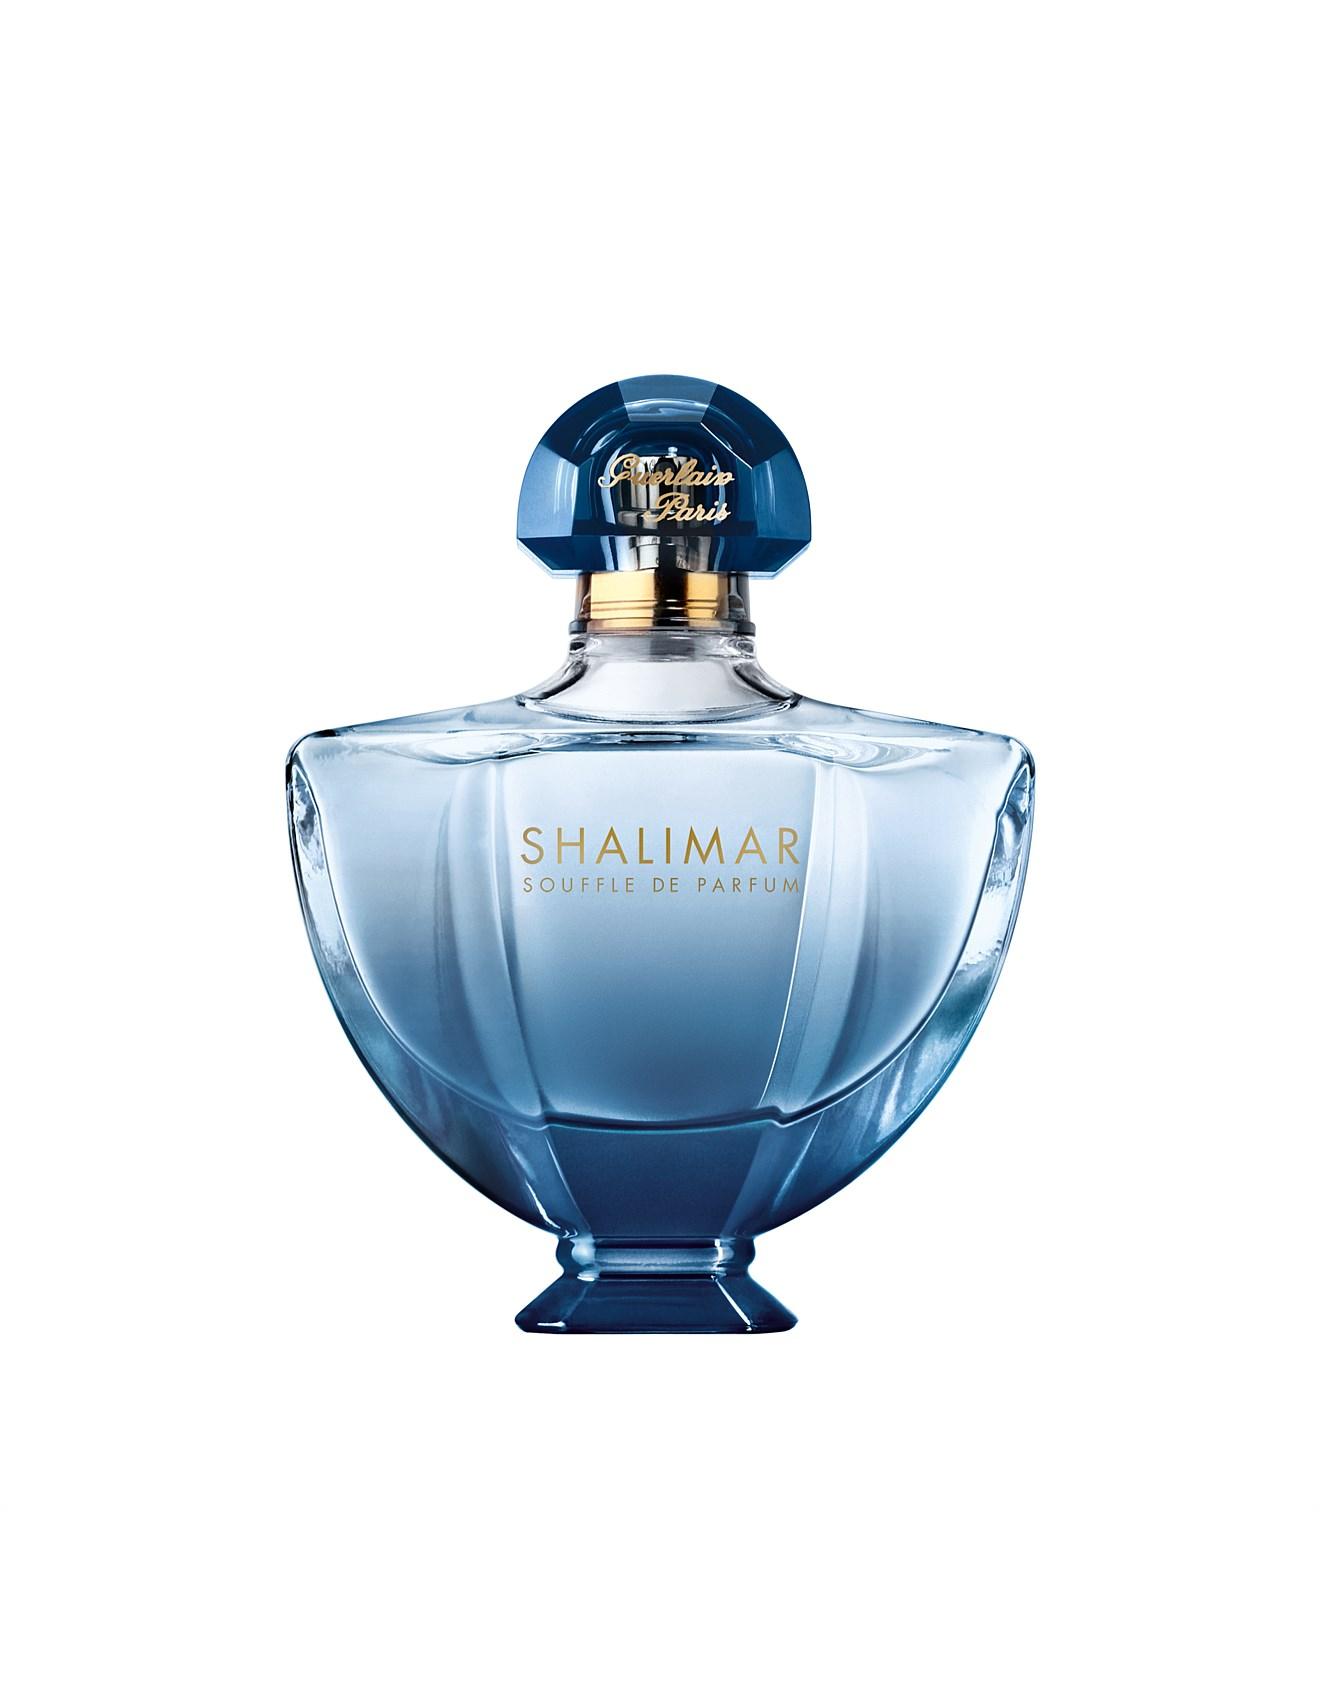 Shalimar 90ml Souffle Shalimar Souffle De Parfum O0Pnw8kX